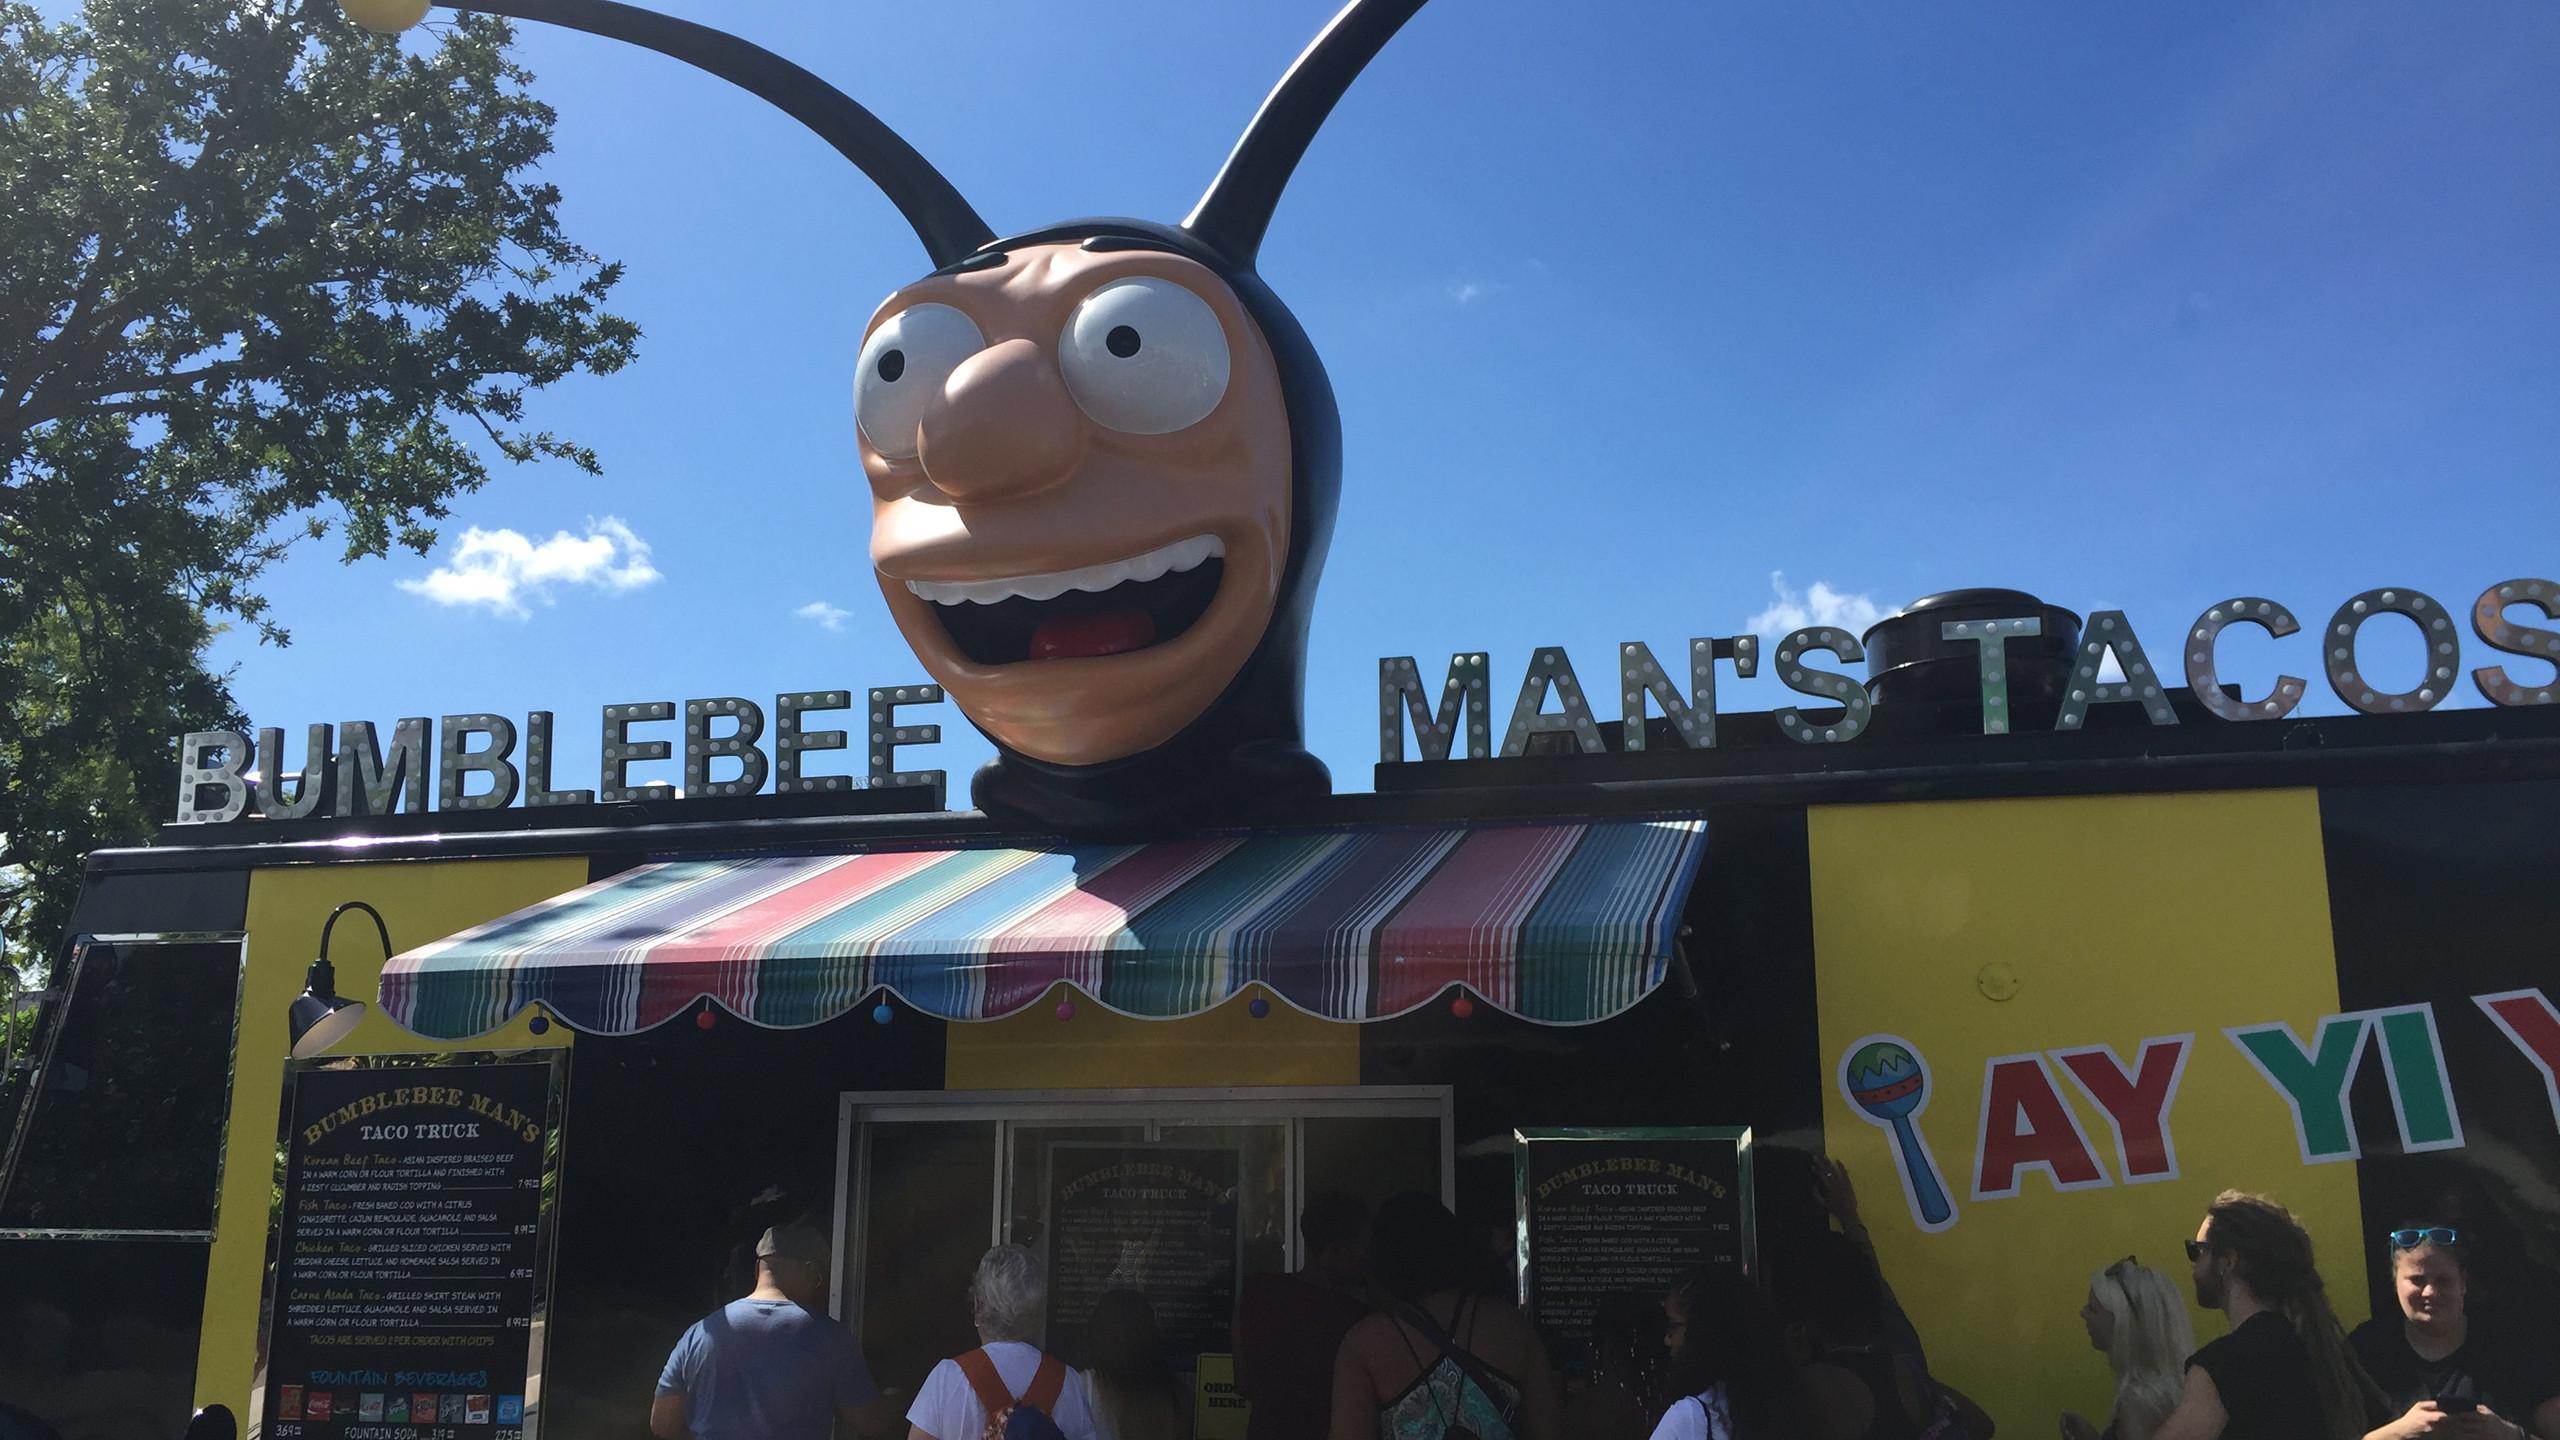 Bumble Bee Man Taco's